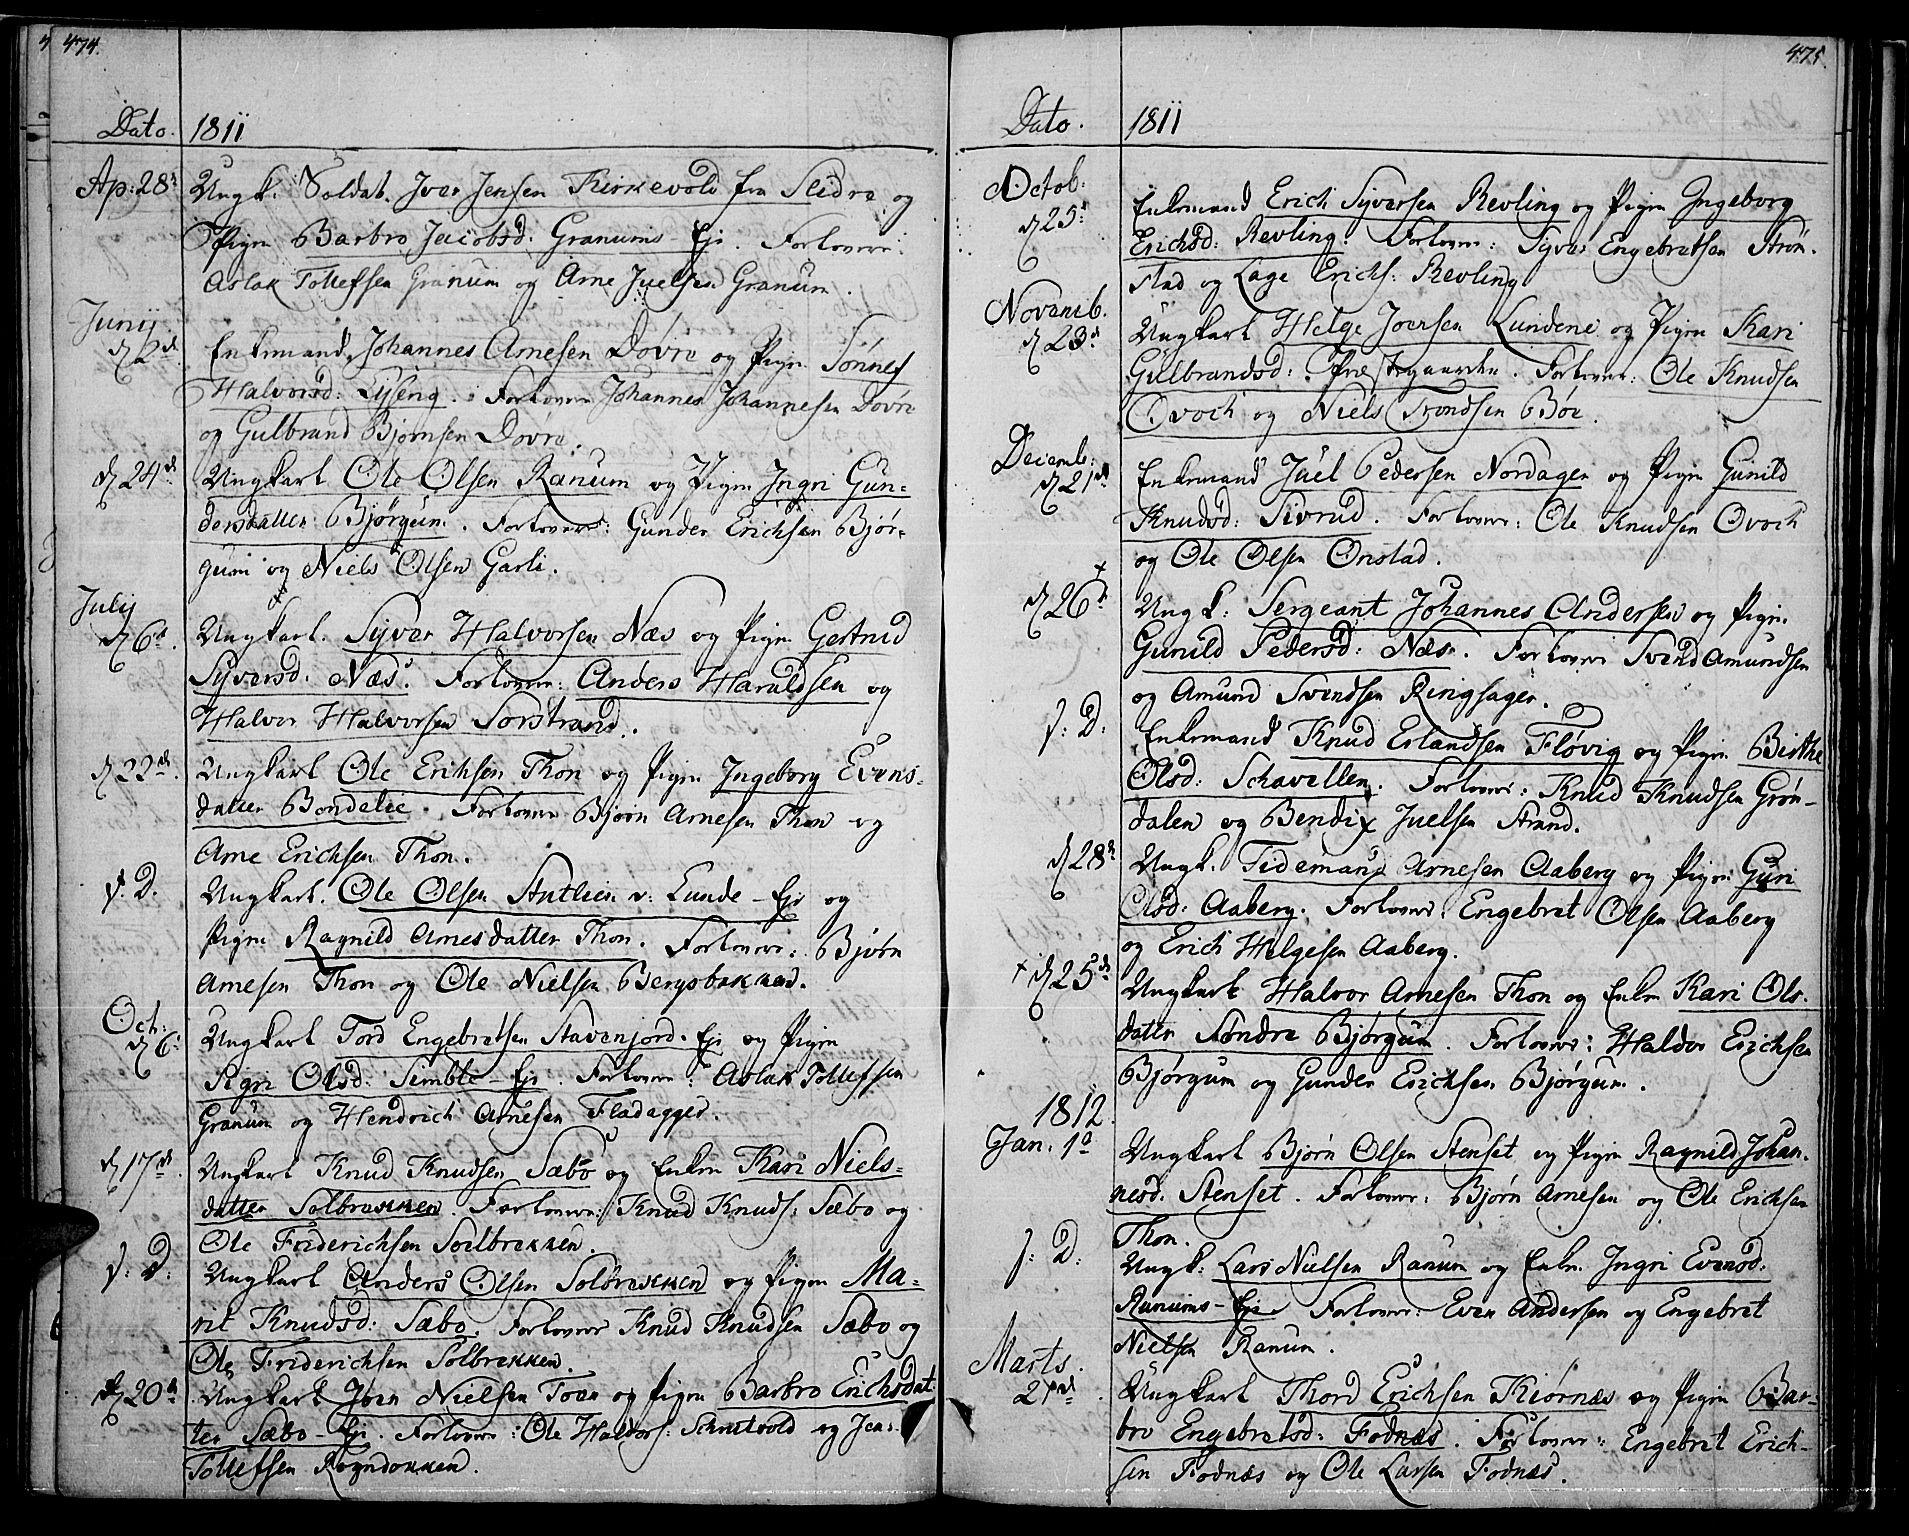 SAH, Nord-Aurdal prestekontor, Ministerialbok nr. 1, 1808-1815, s. 474-475